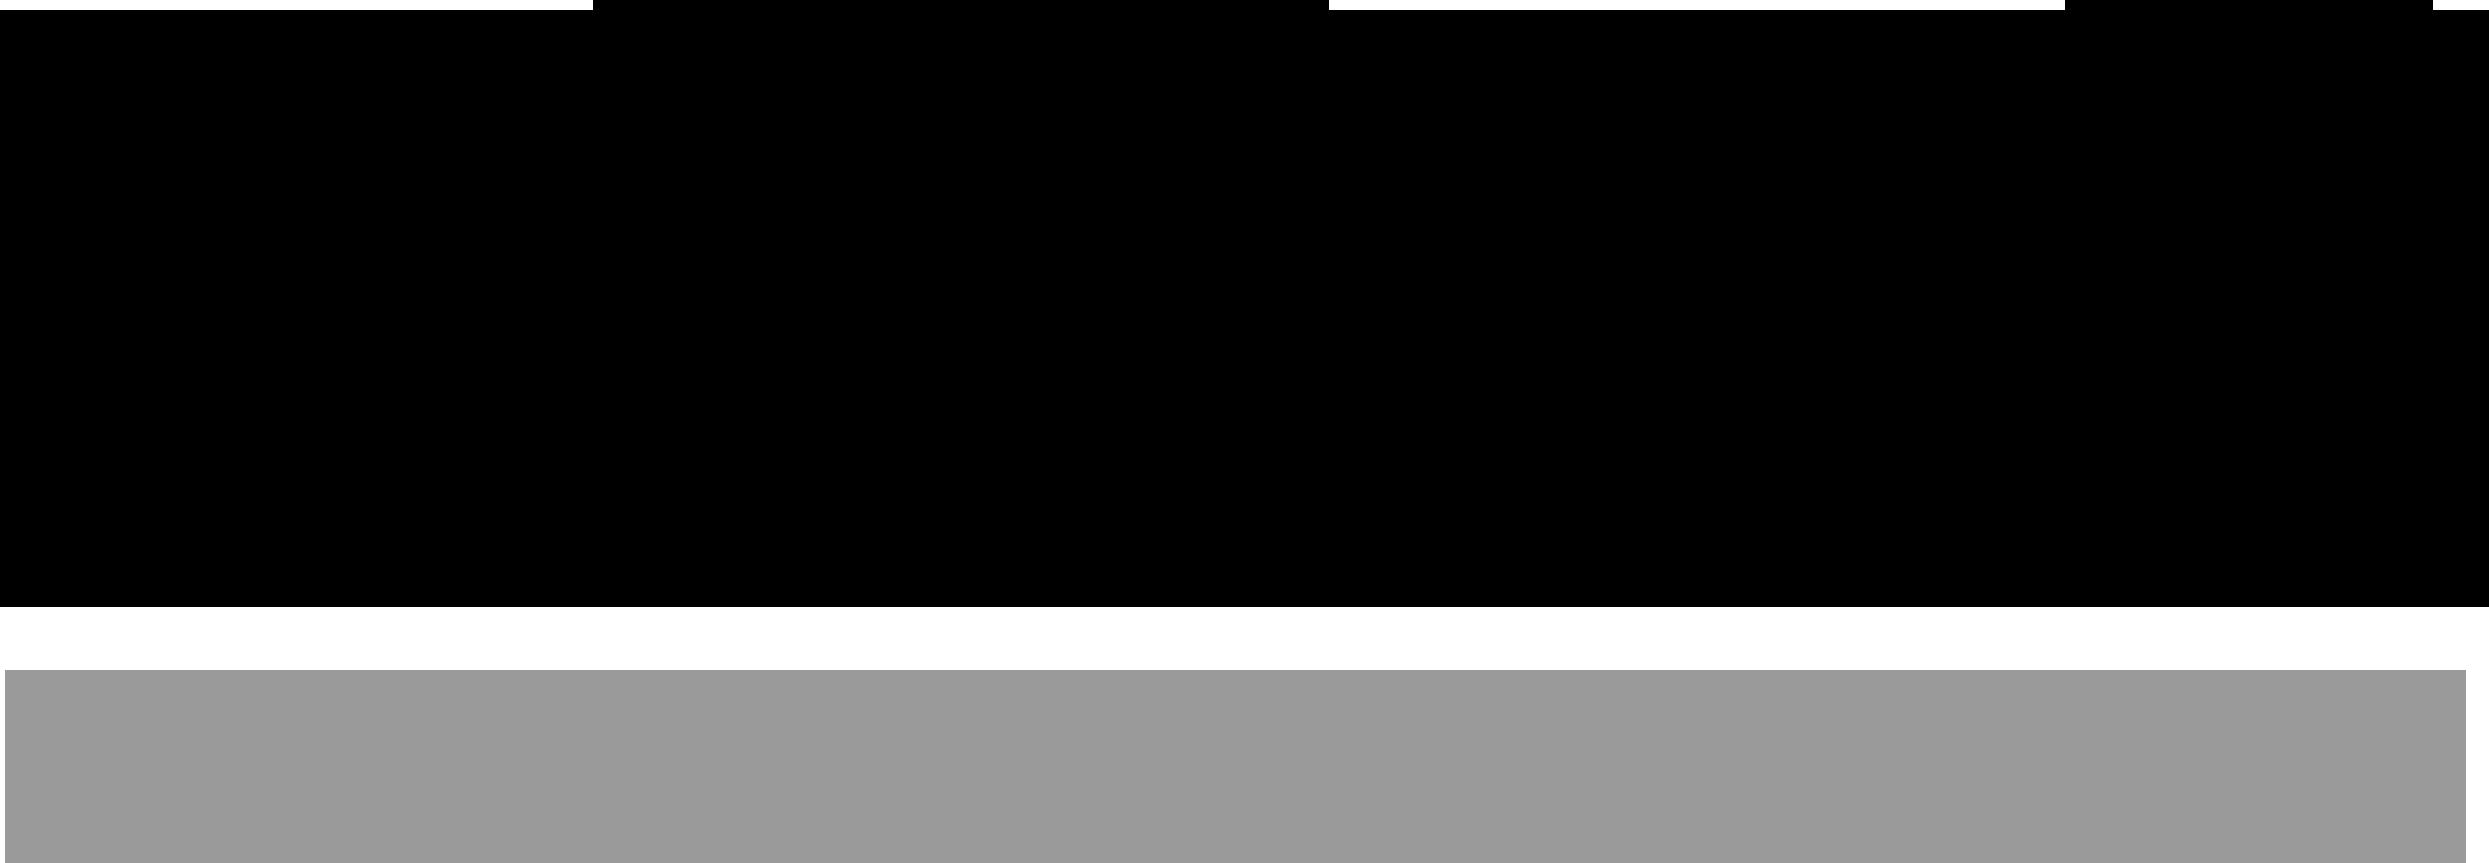 MOYO logo black